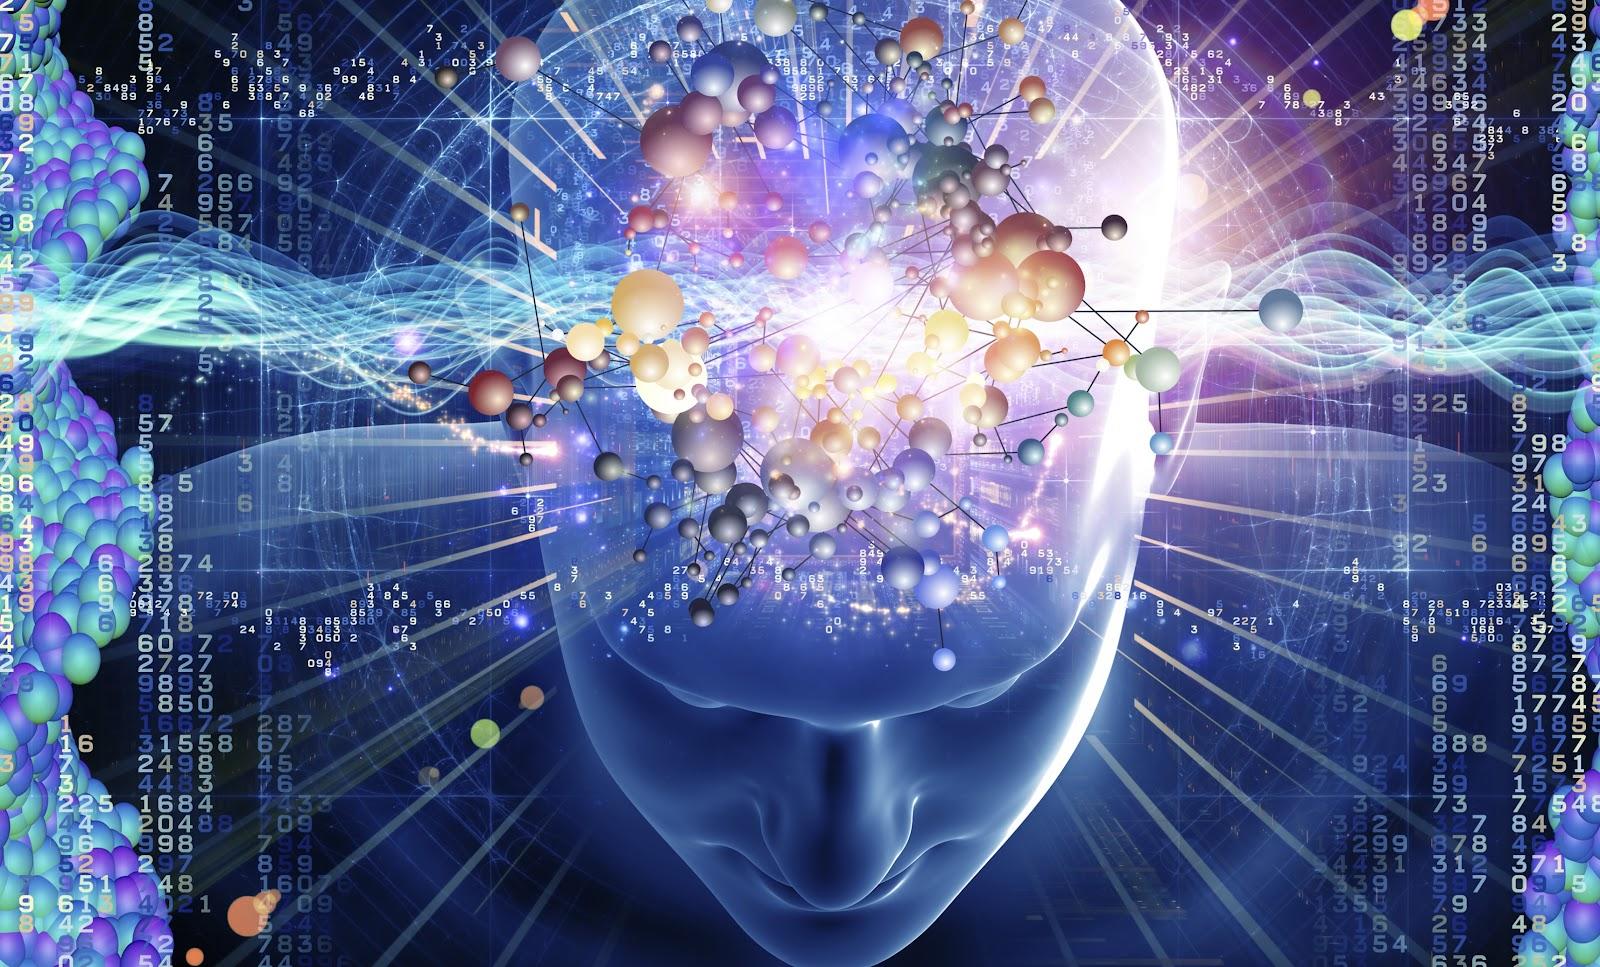 brain-evolution-orig-crop-1.jpg